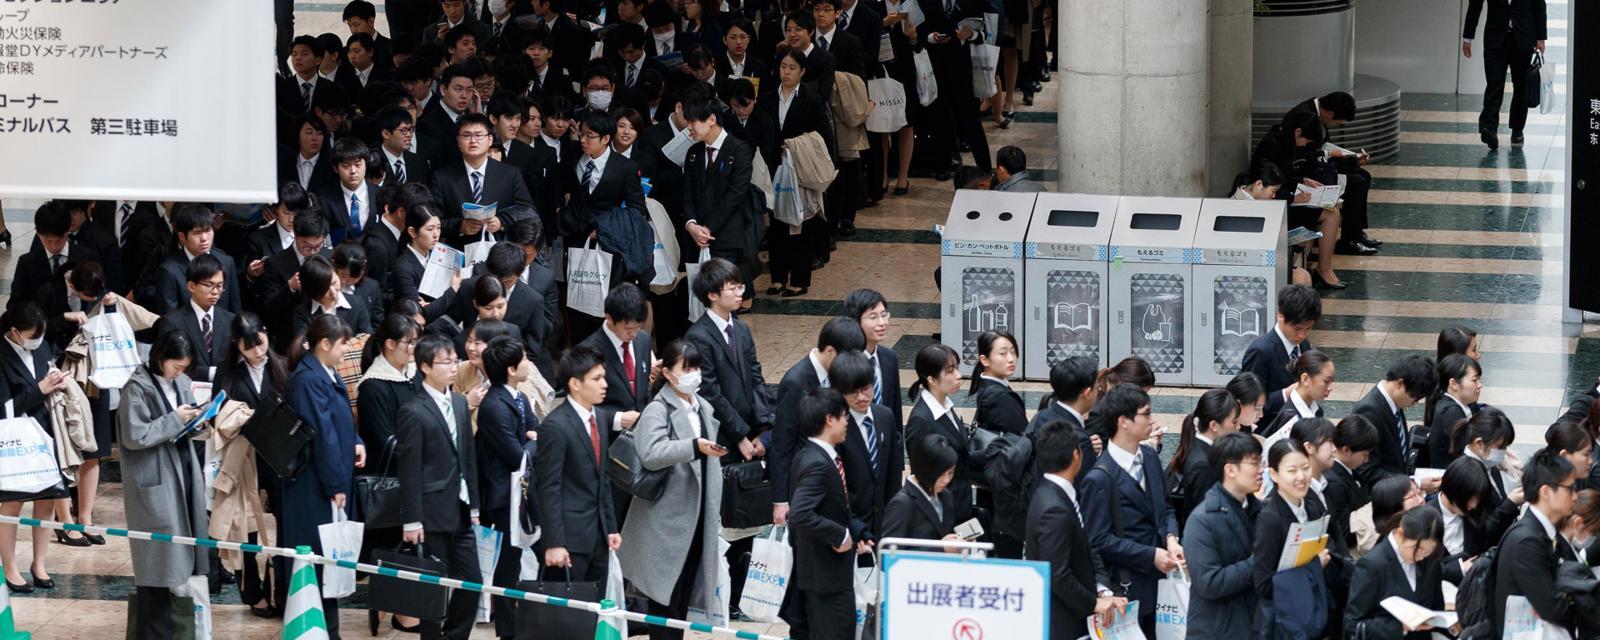 >Why Japan's 'shūkatsu' job-seeking system is changing